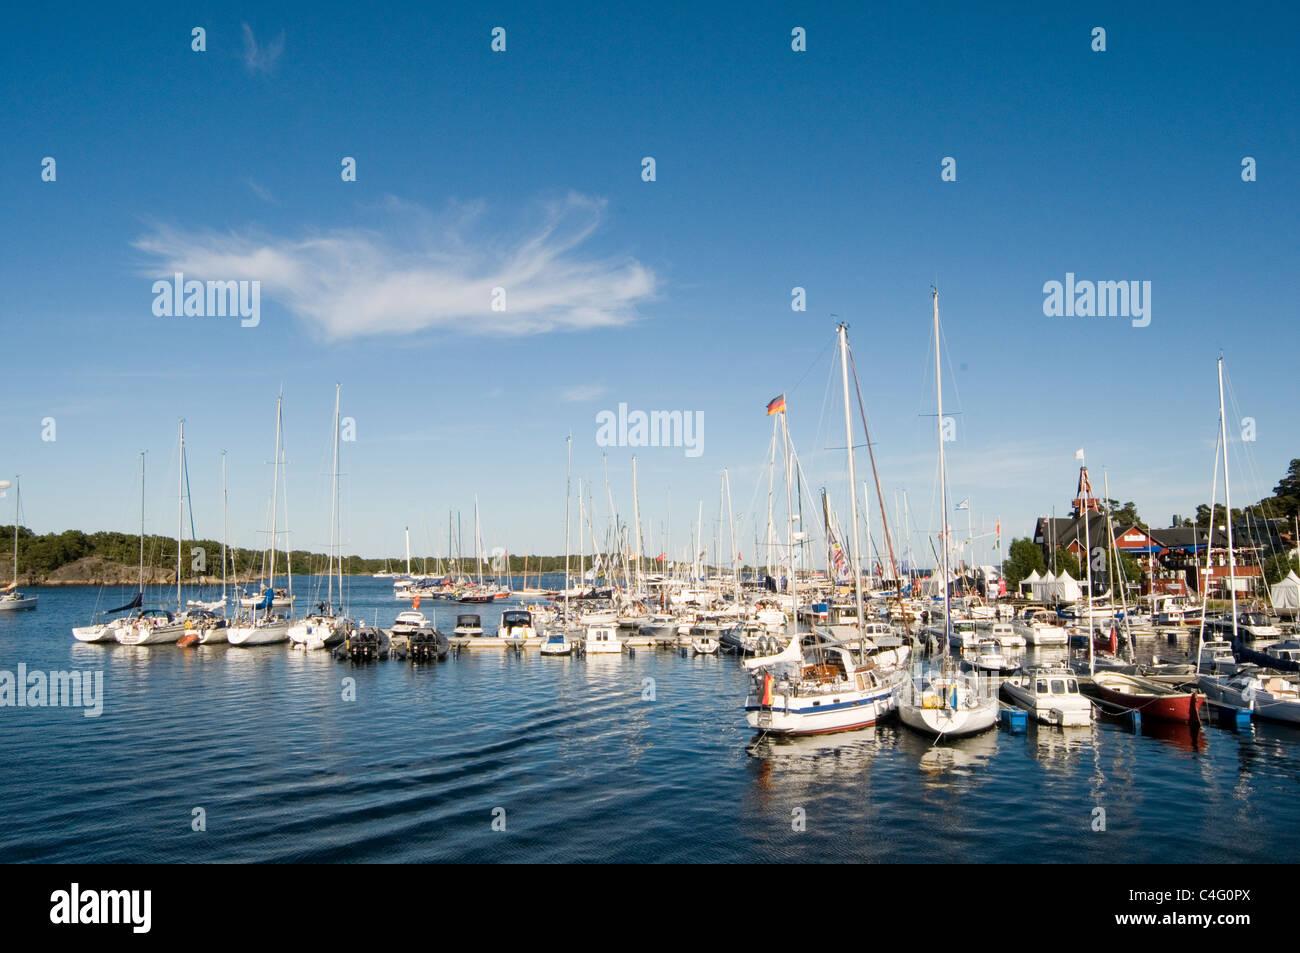 sandhamn harbour harbor stockholm archipelagos island sweden swedish batlic sea - Stock Image